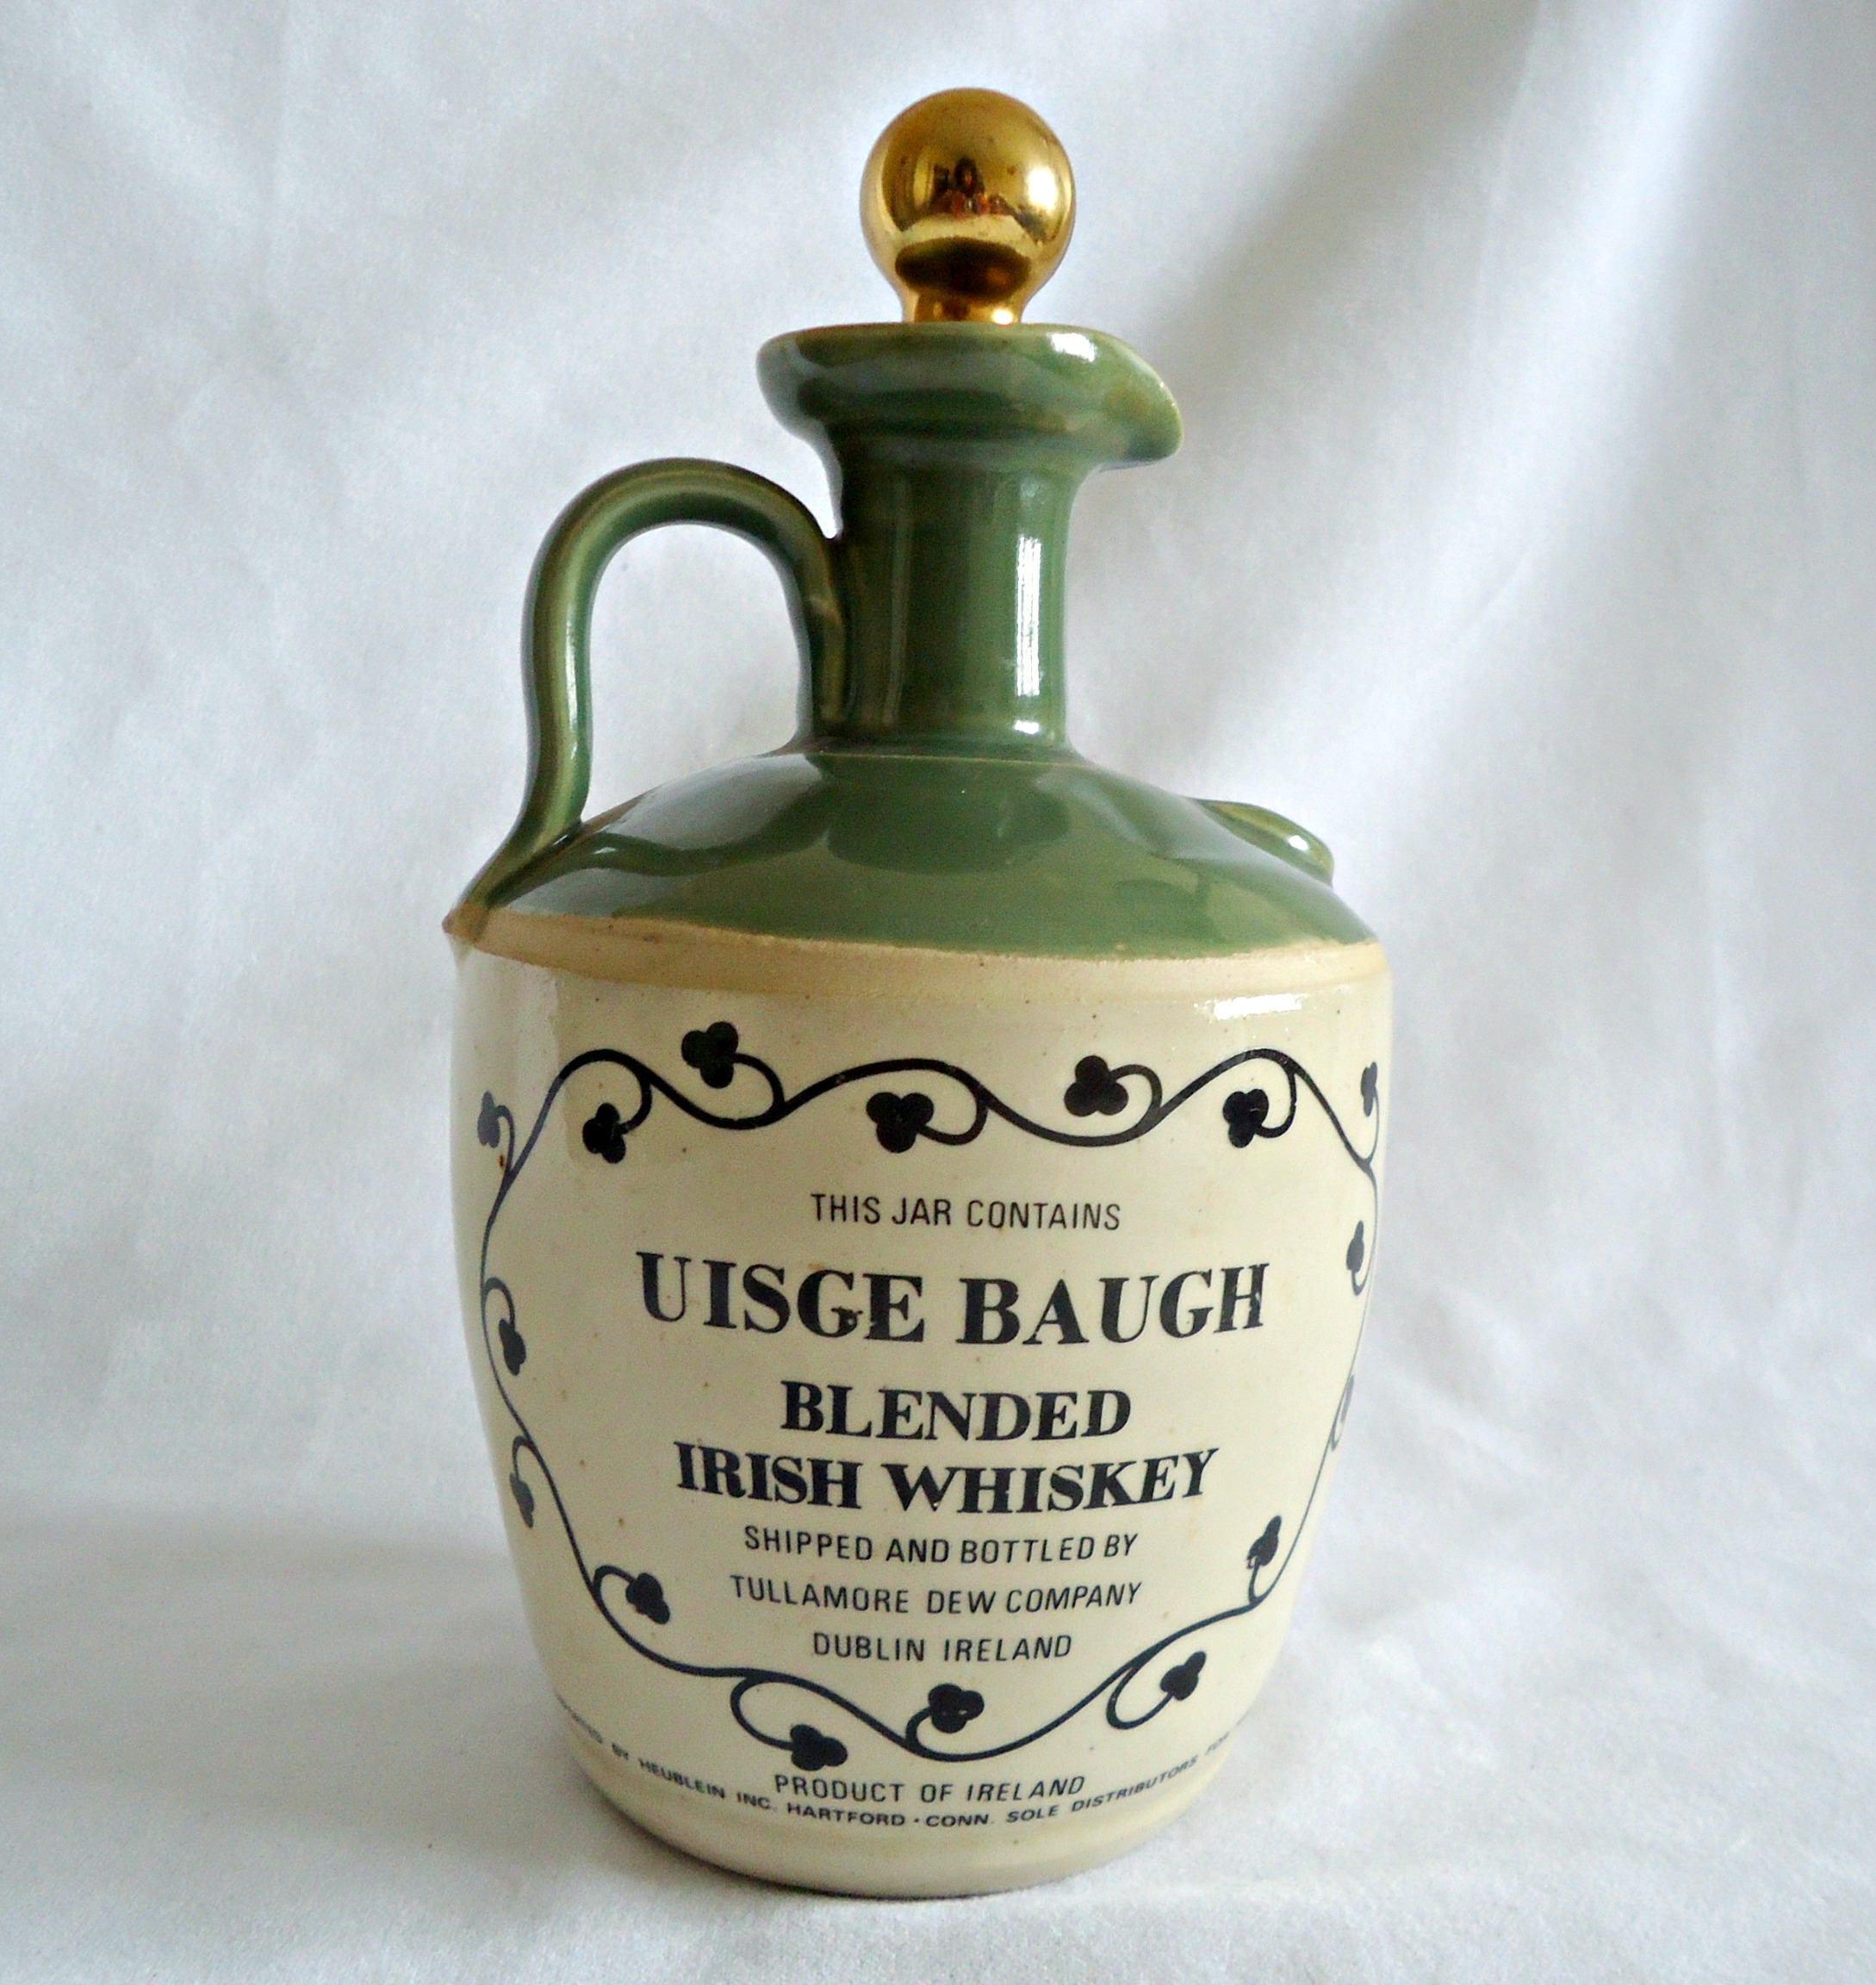 Vintage Whiskey Jug Tullamore Dew Uisge Baugh Irish Whiskey